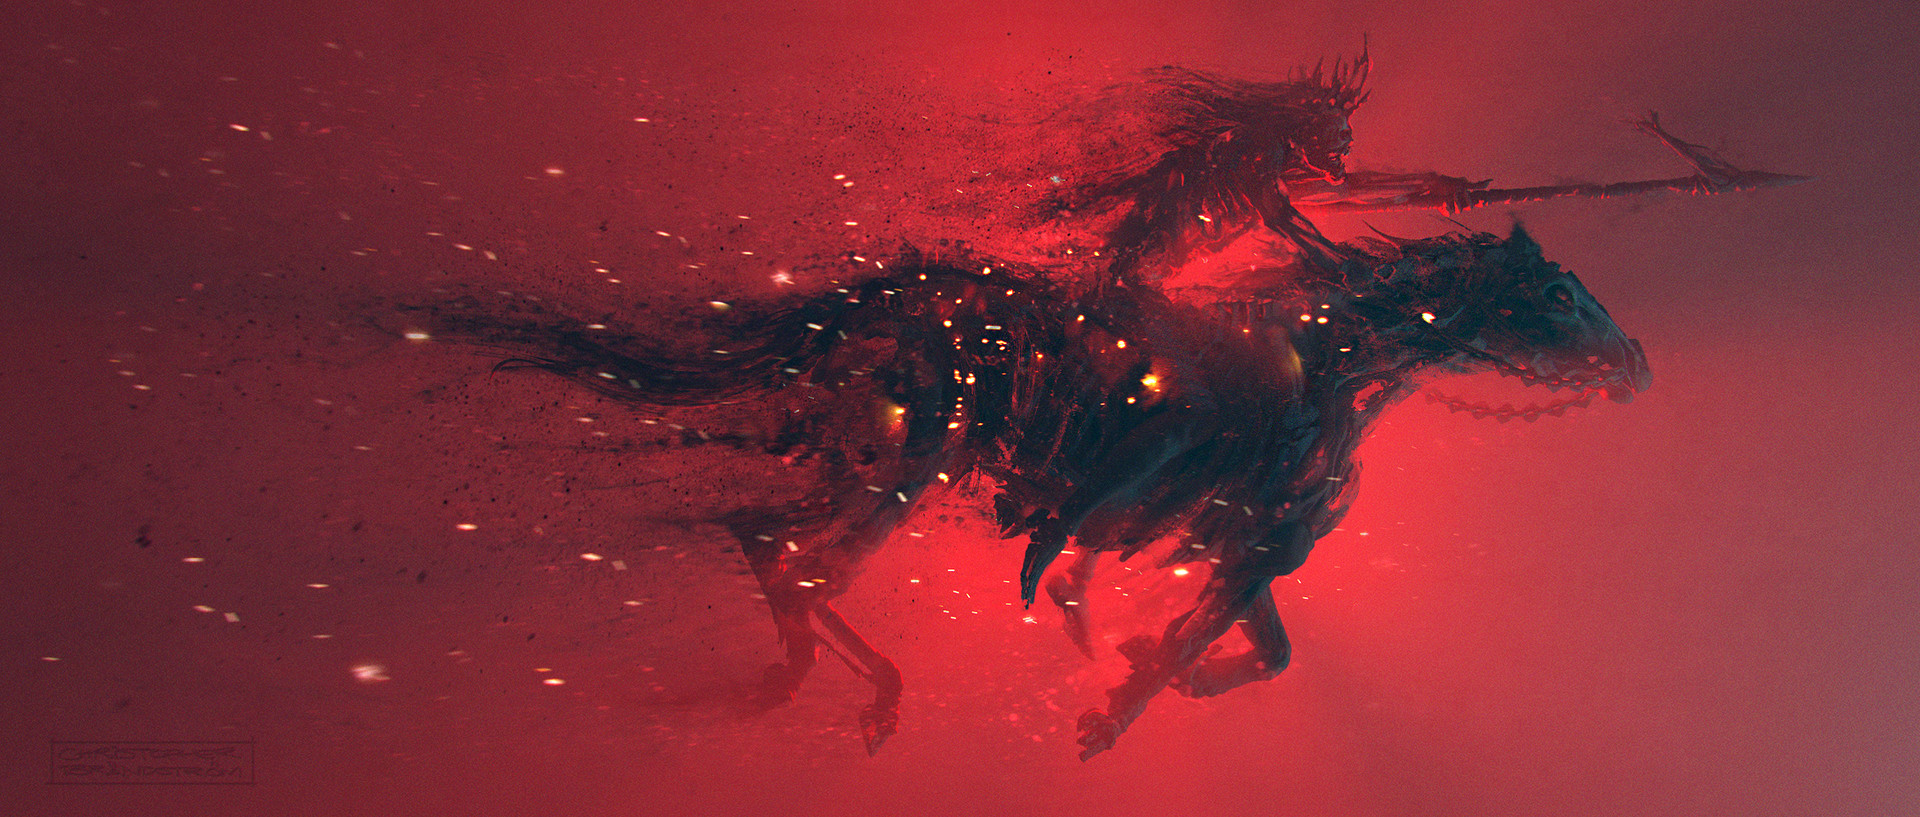 General 1920x817 horse skeleton digital dead spear artwork red